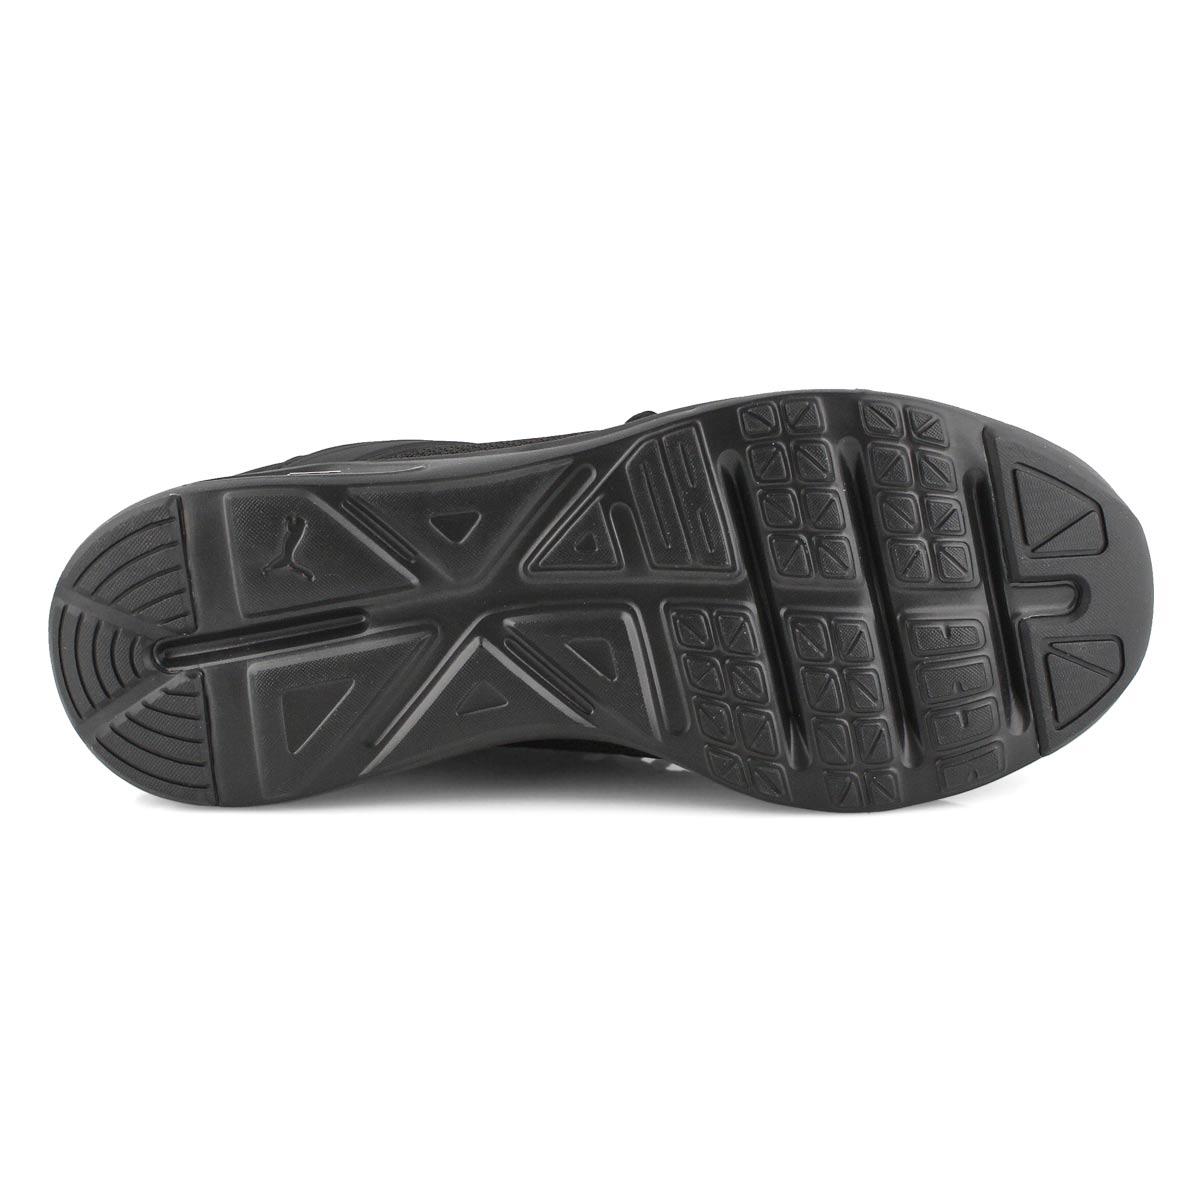 Men's Enzo 2 Sneaker - Black